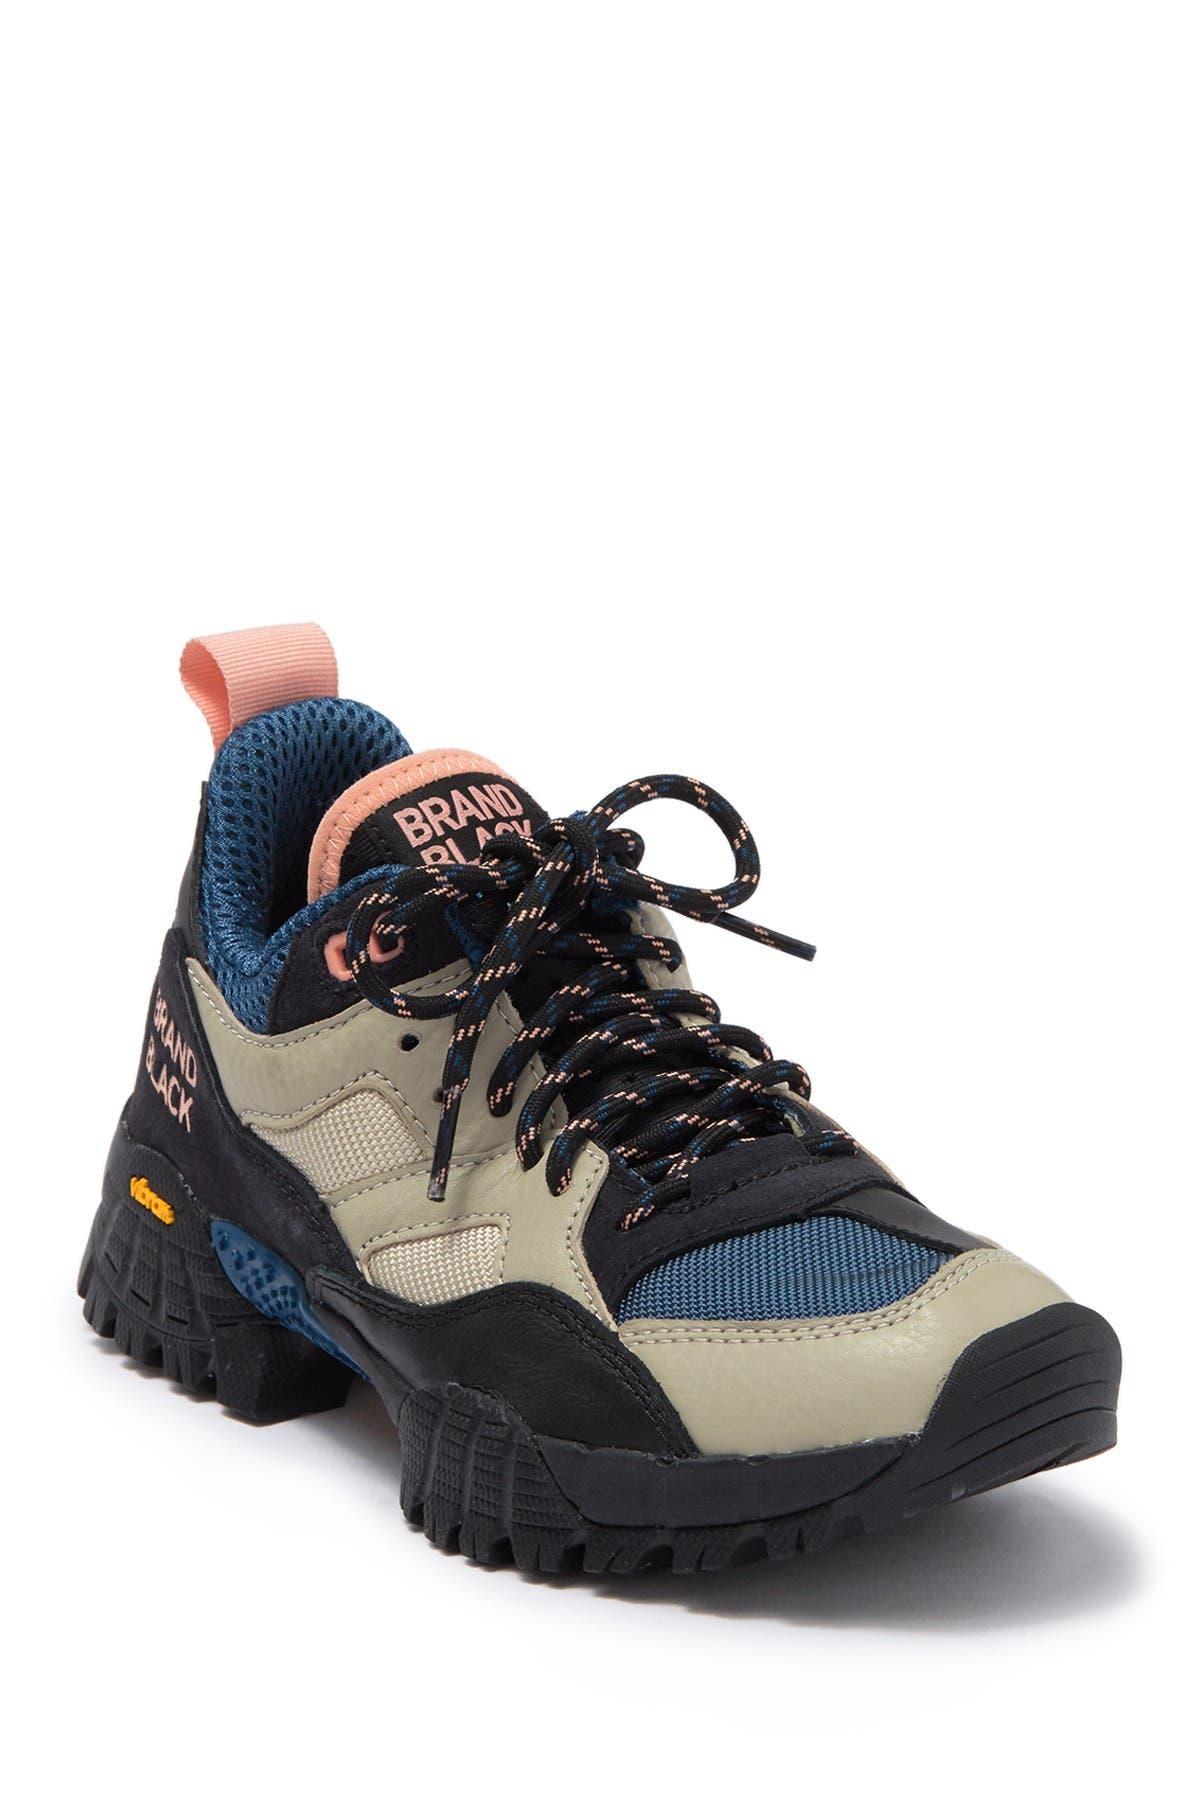 Image of Brandblack Cresta Sneaker